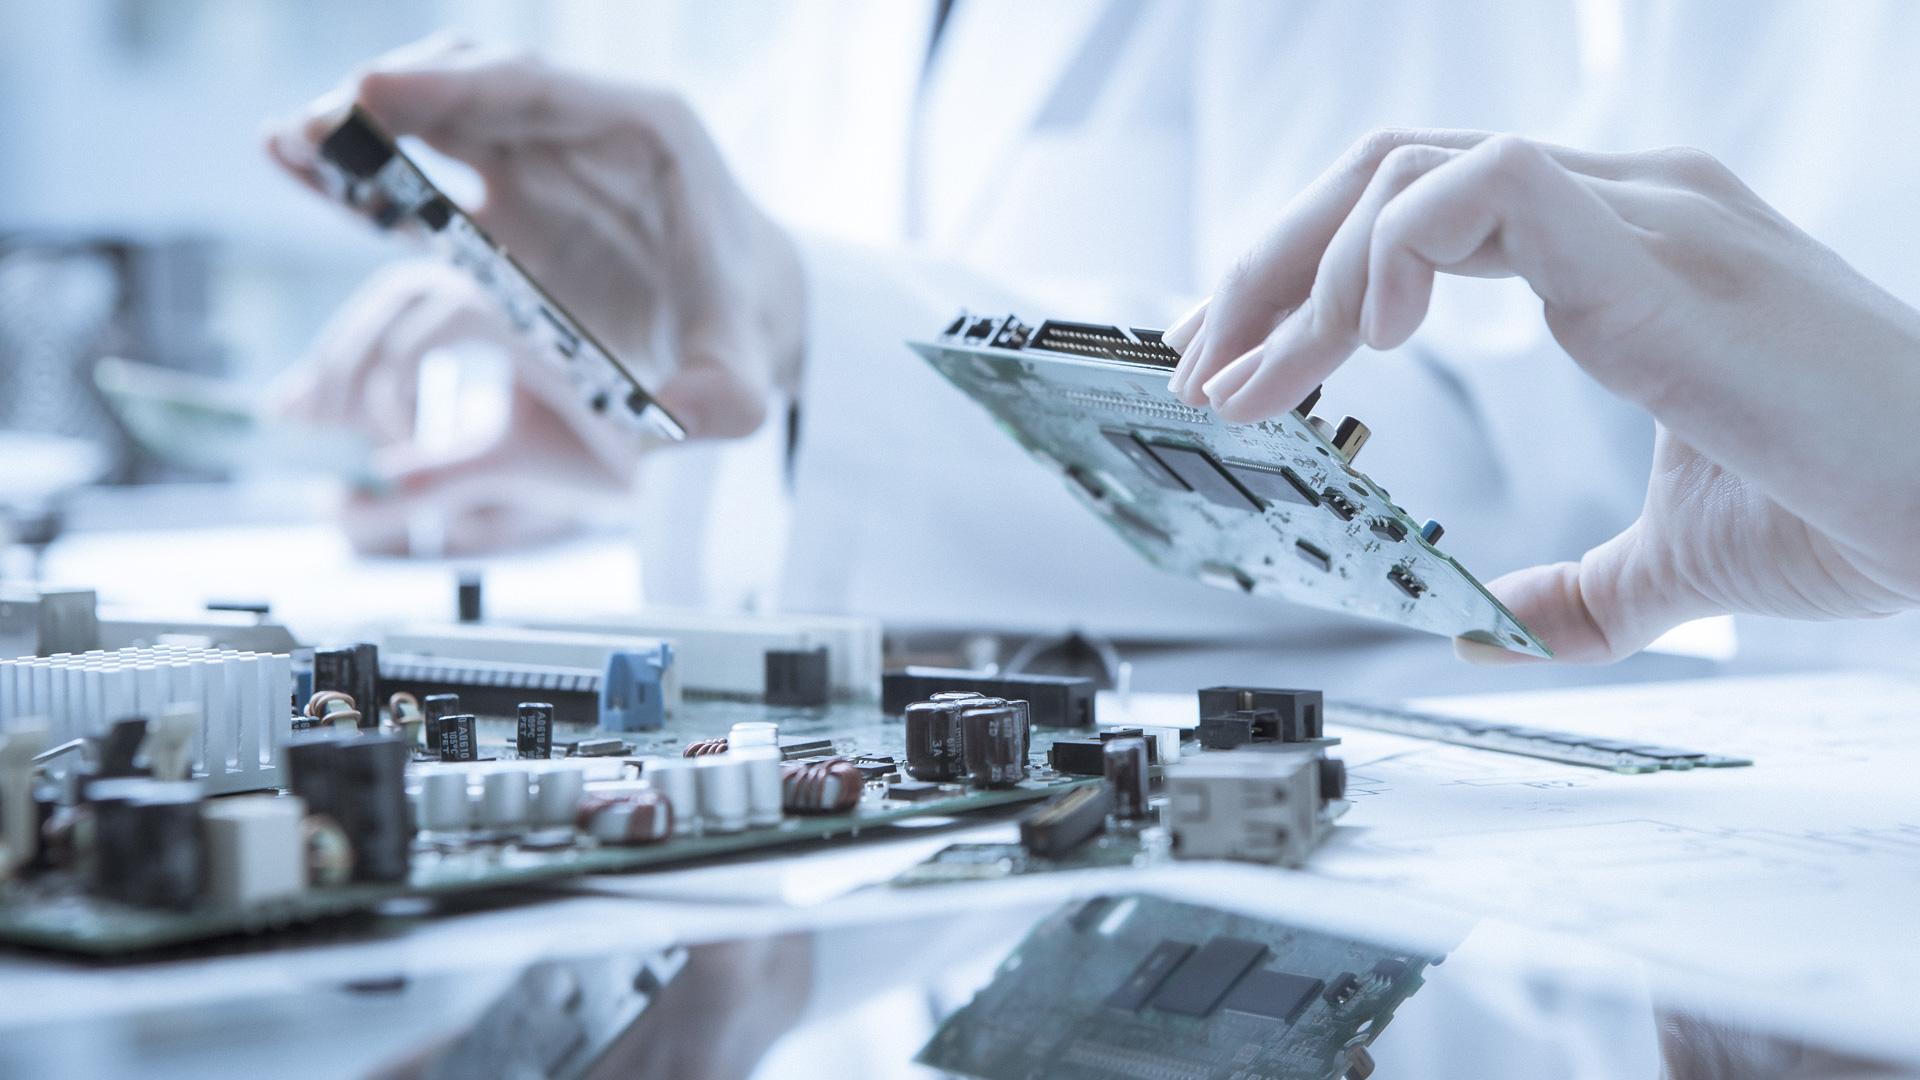 Evatronix Pcb Quality Control Systems